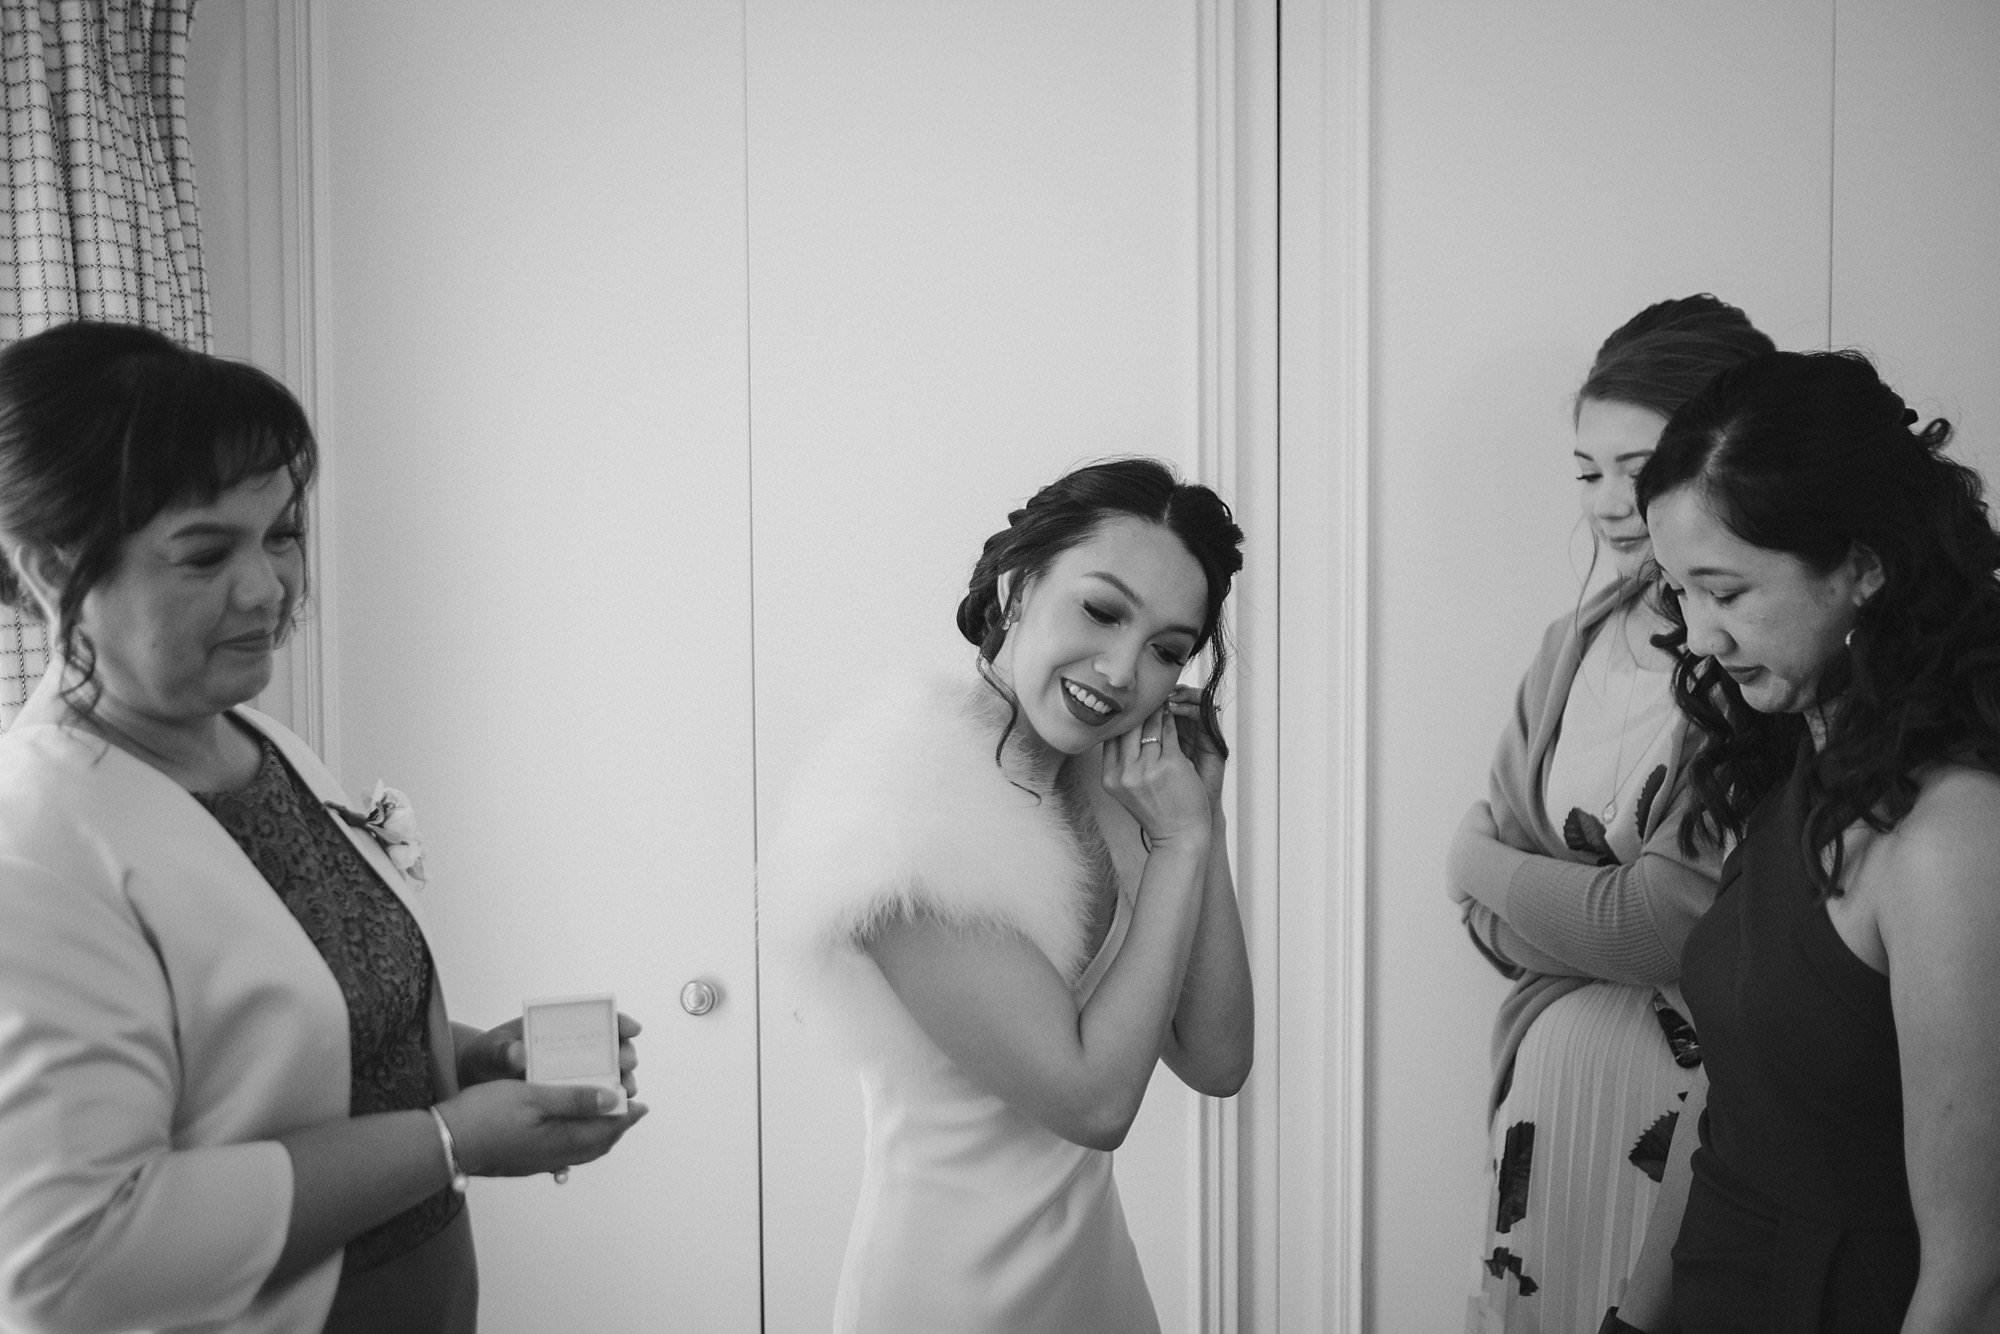 chelsea old town hall wedding photographer st 013 - Stephanie & Tim